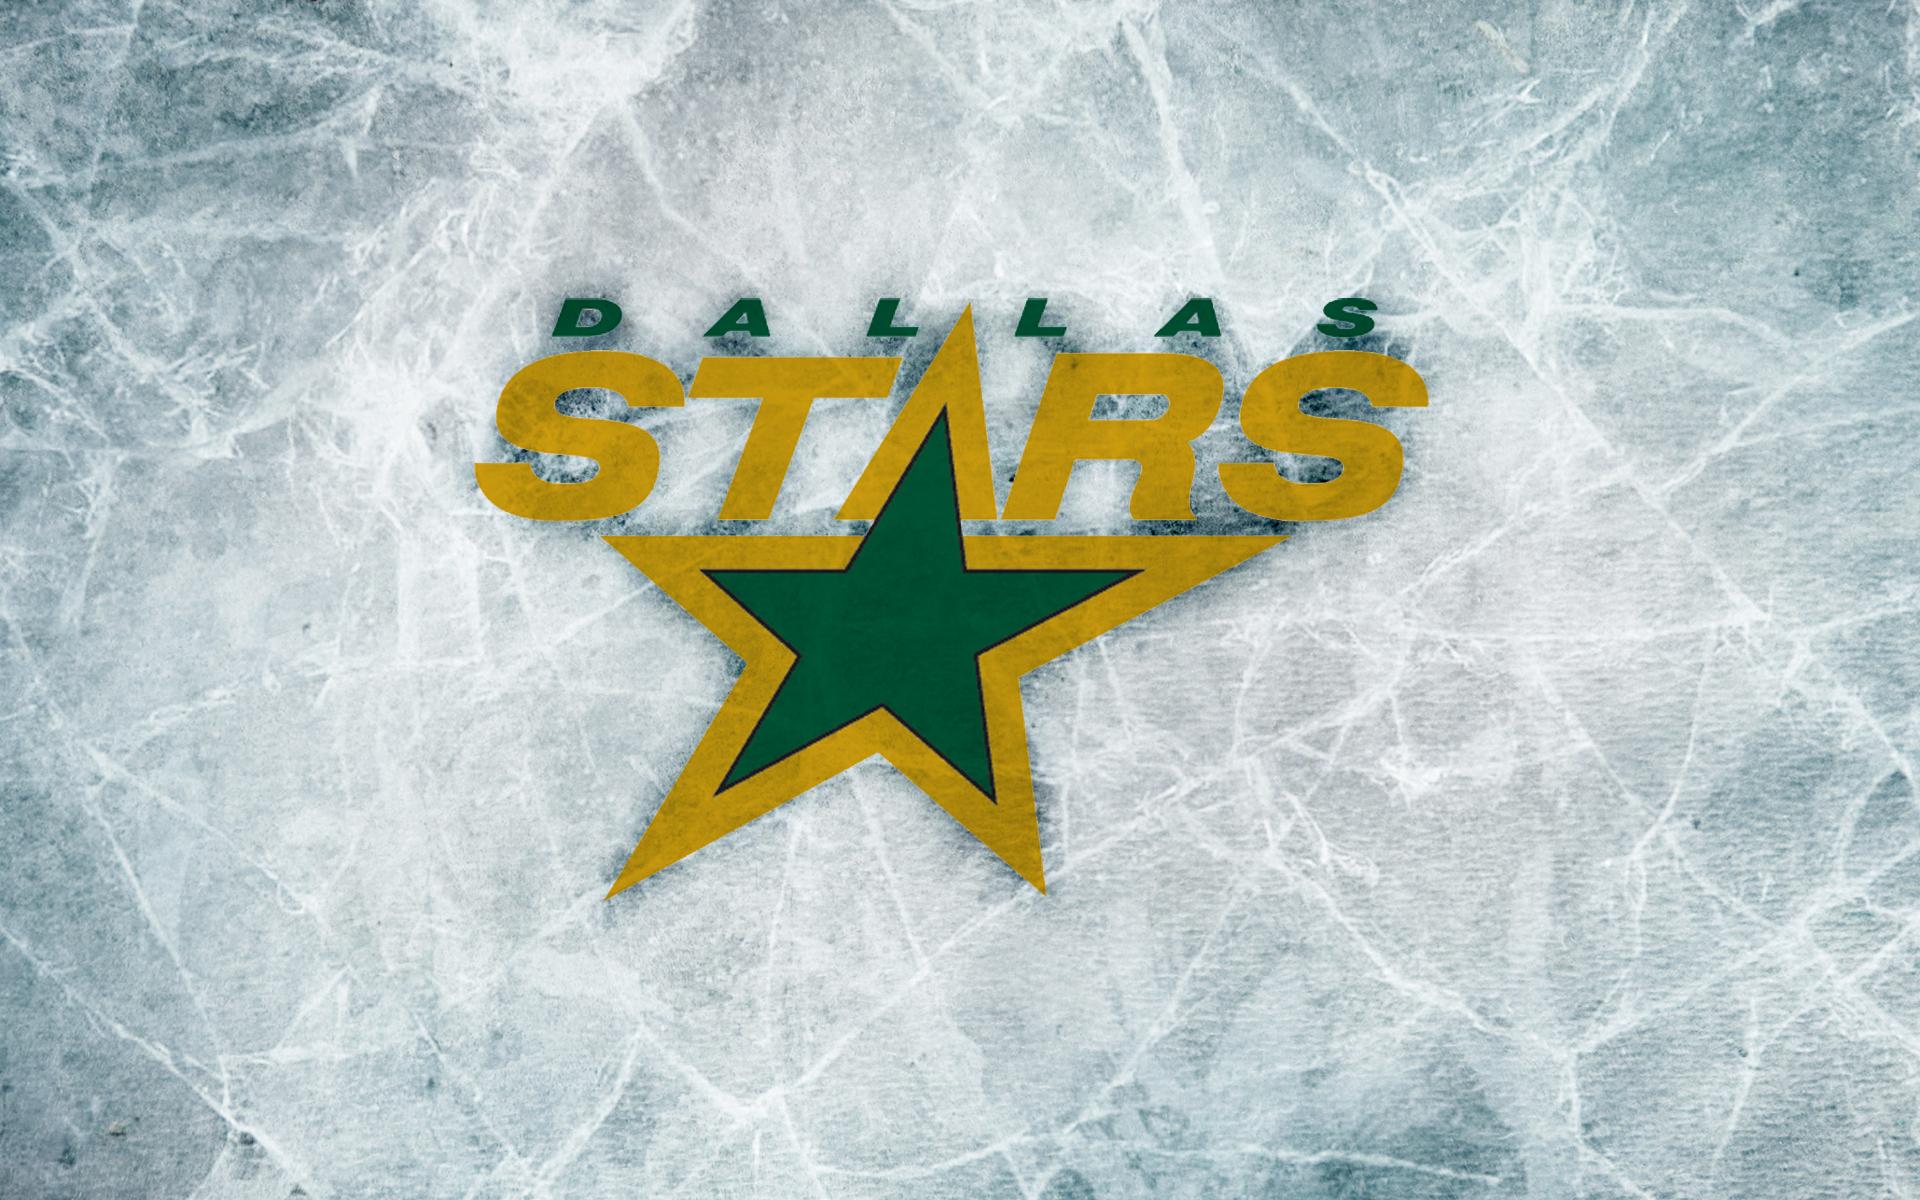 Dallas Stars Wallpaper 2014 Dallas Stars Wallpaper...